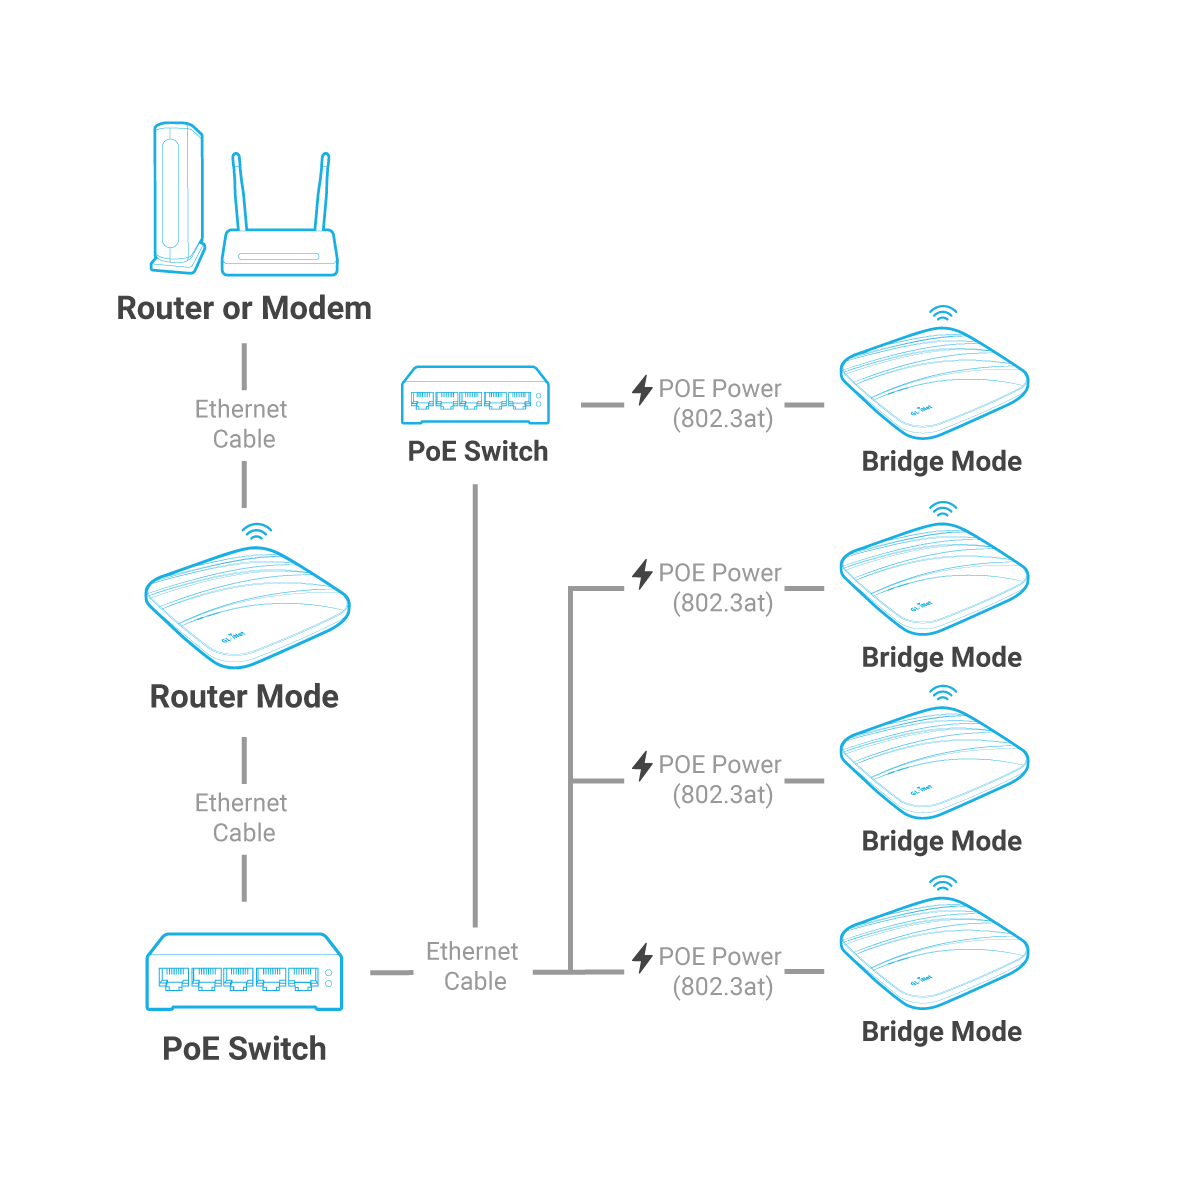 Multiple Device Deployment in Extended Bridge Mode